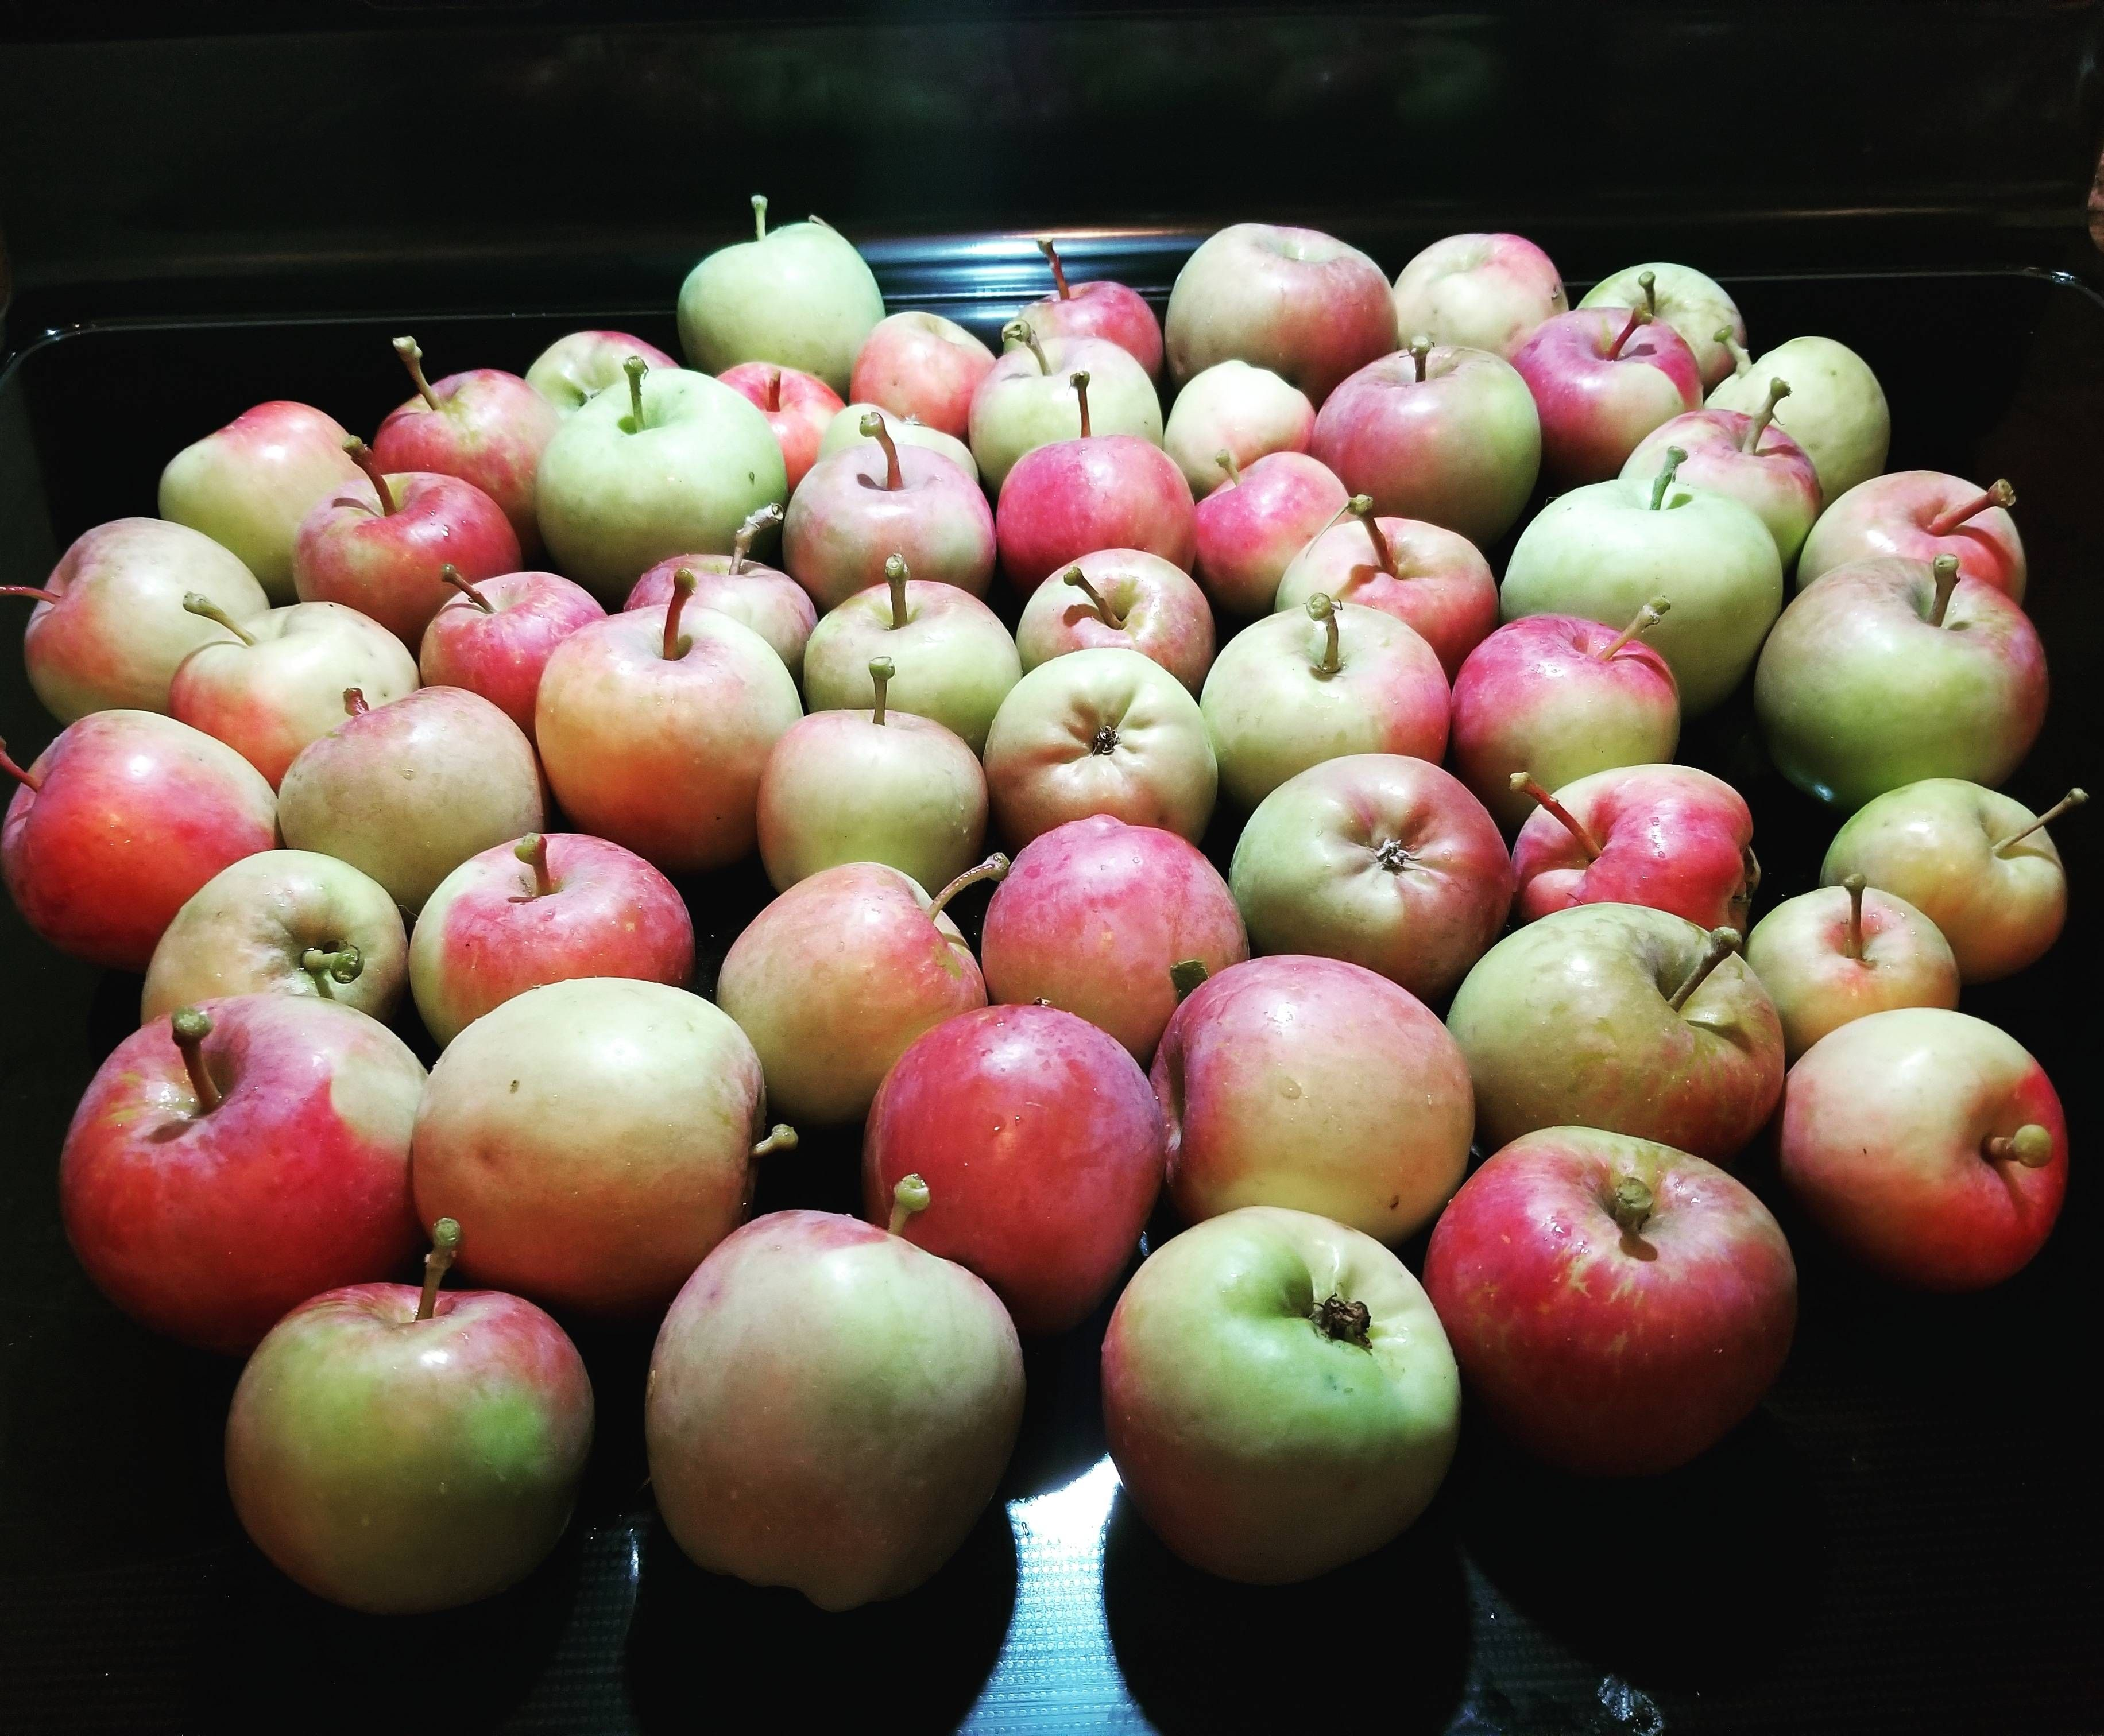 Year 3 From My 11 Fuji Apple Tree From Costco Gardening Garden